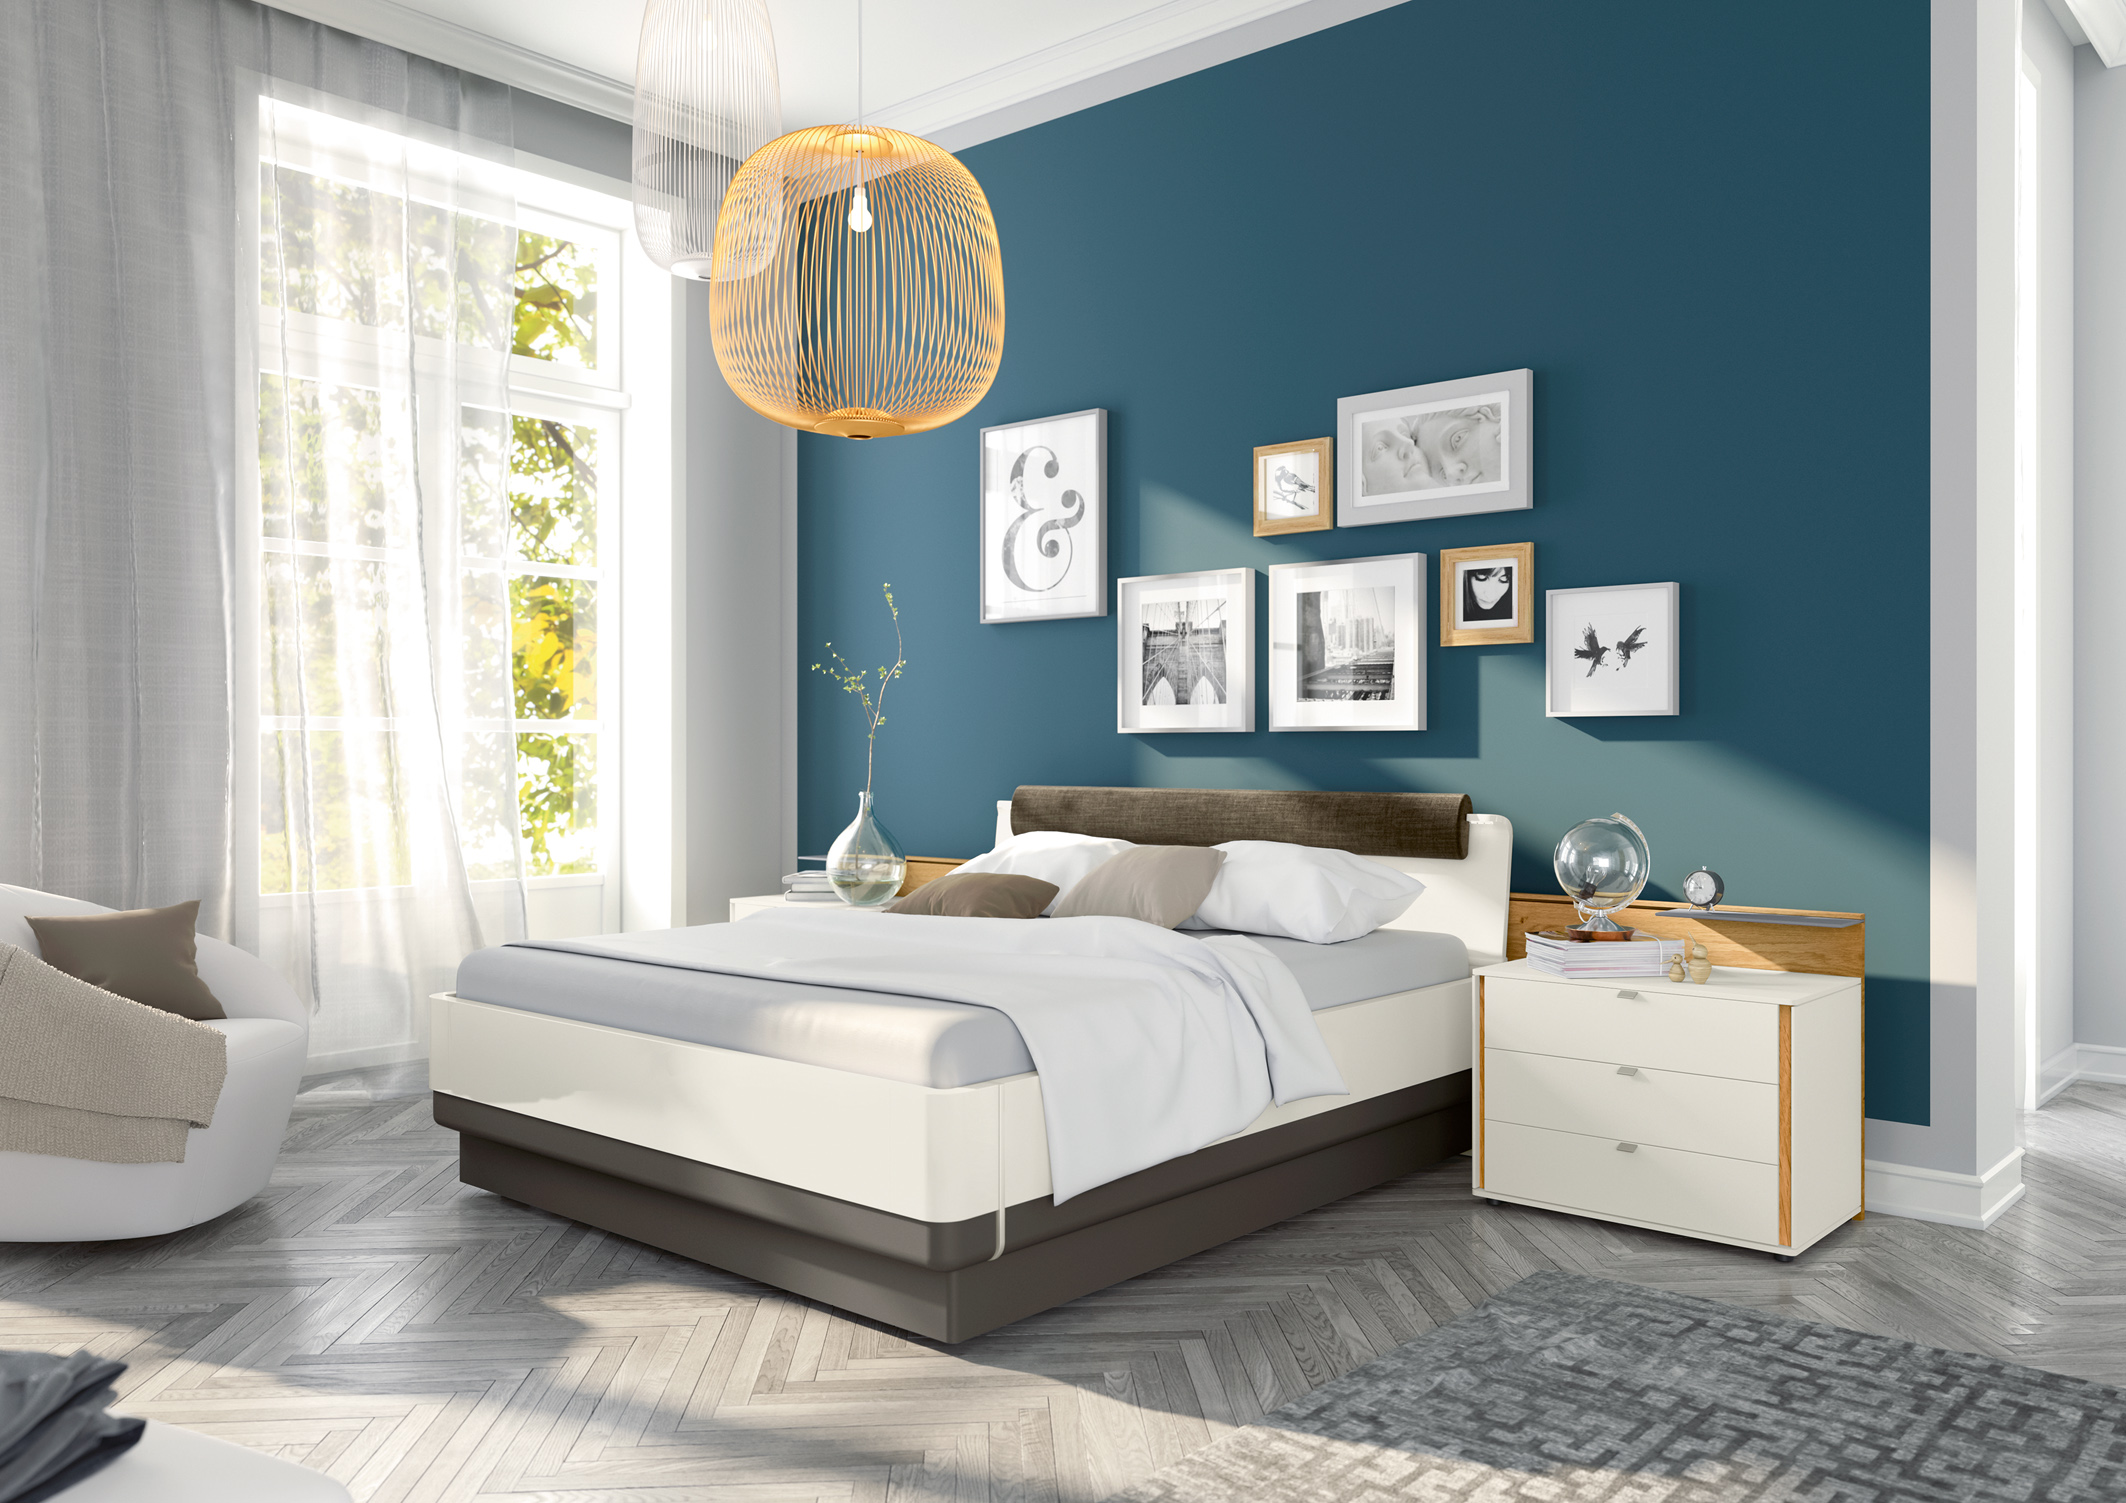 vdm 2017 pm huelsta4. Black Bedroom Furniture Sets. Home Design Ideas